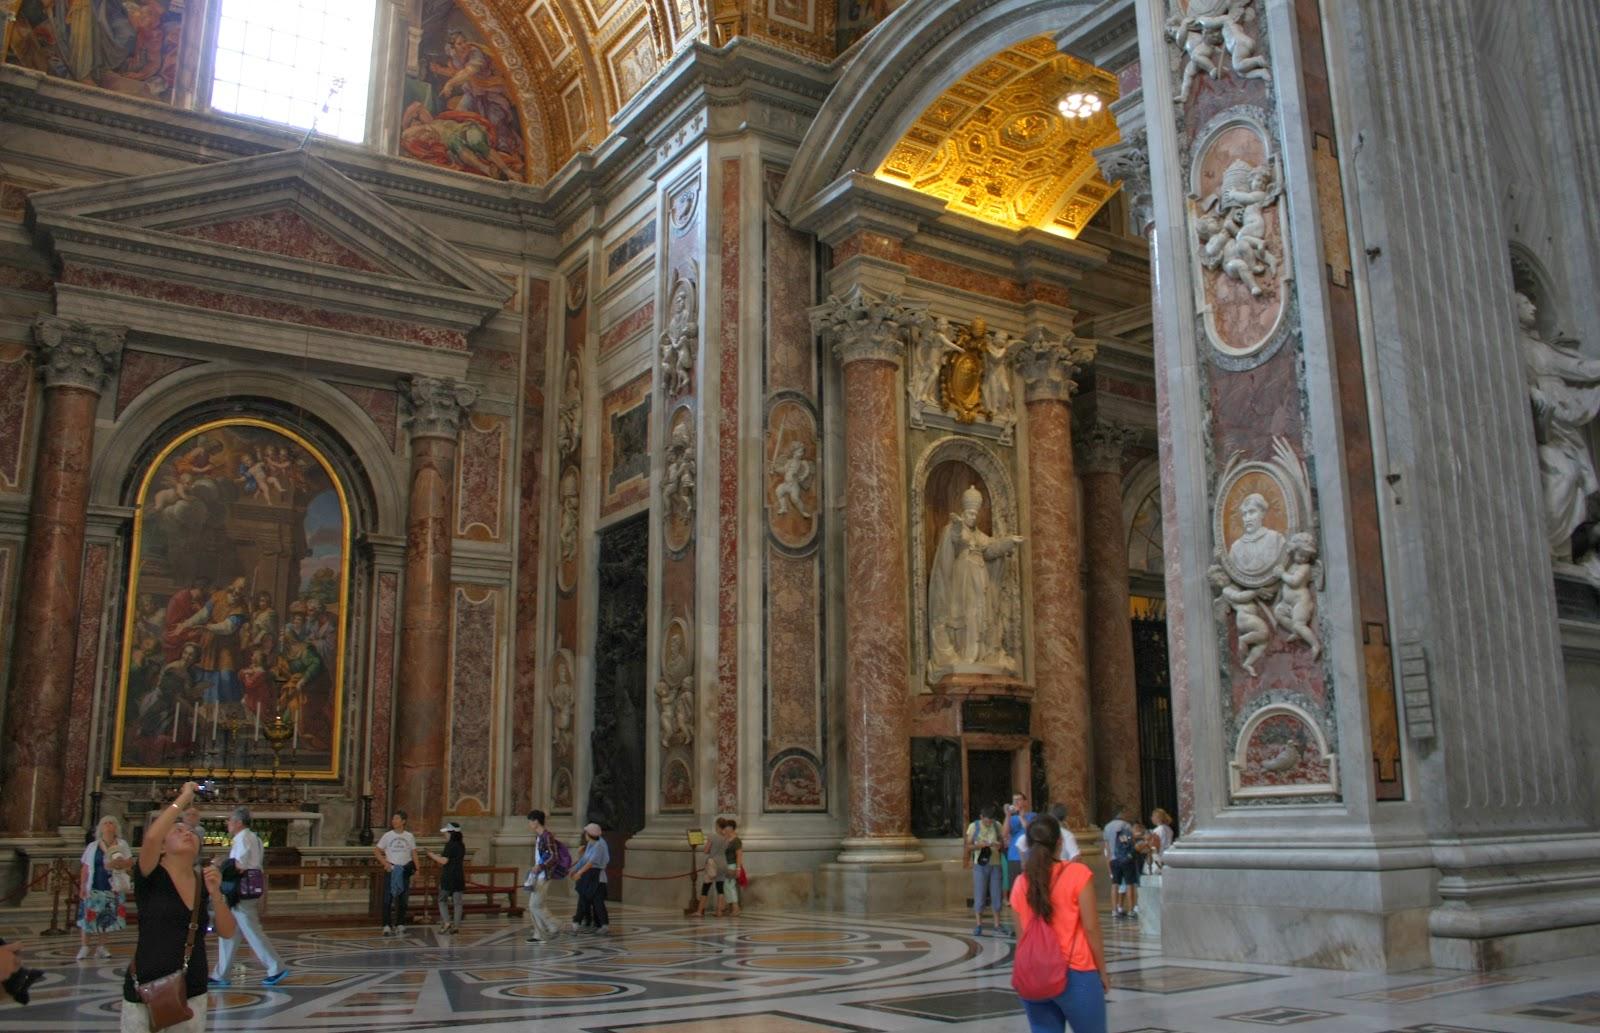 basilica de san pedro roma vaticano